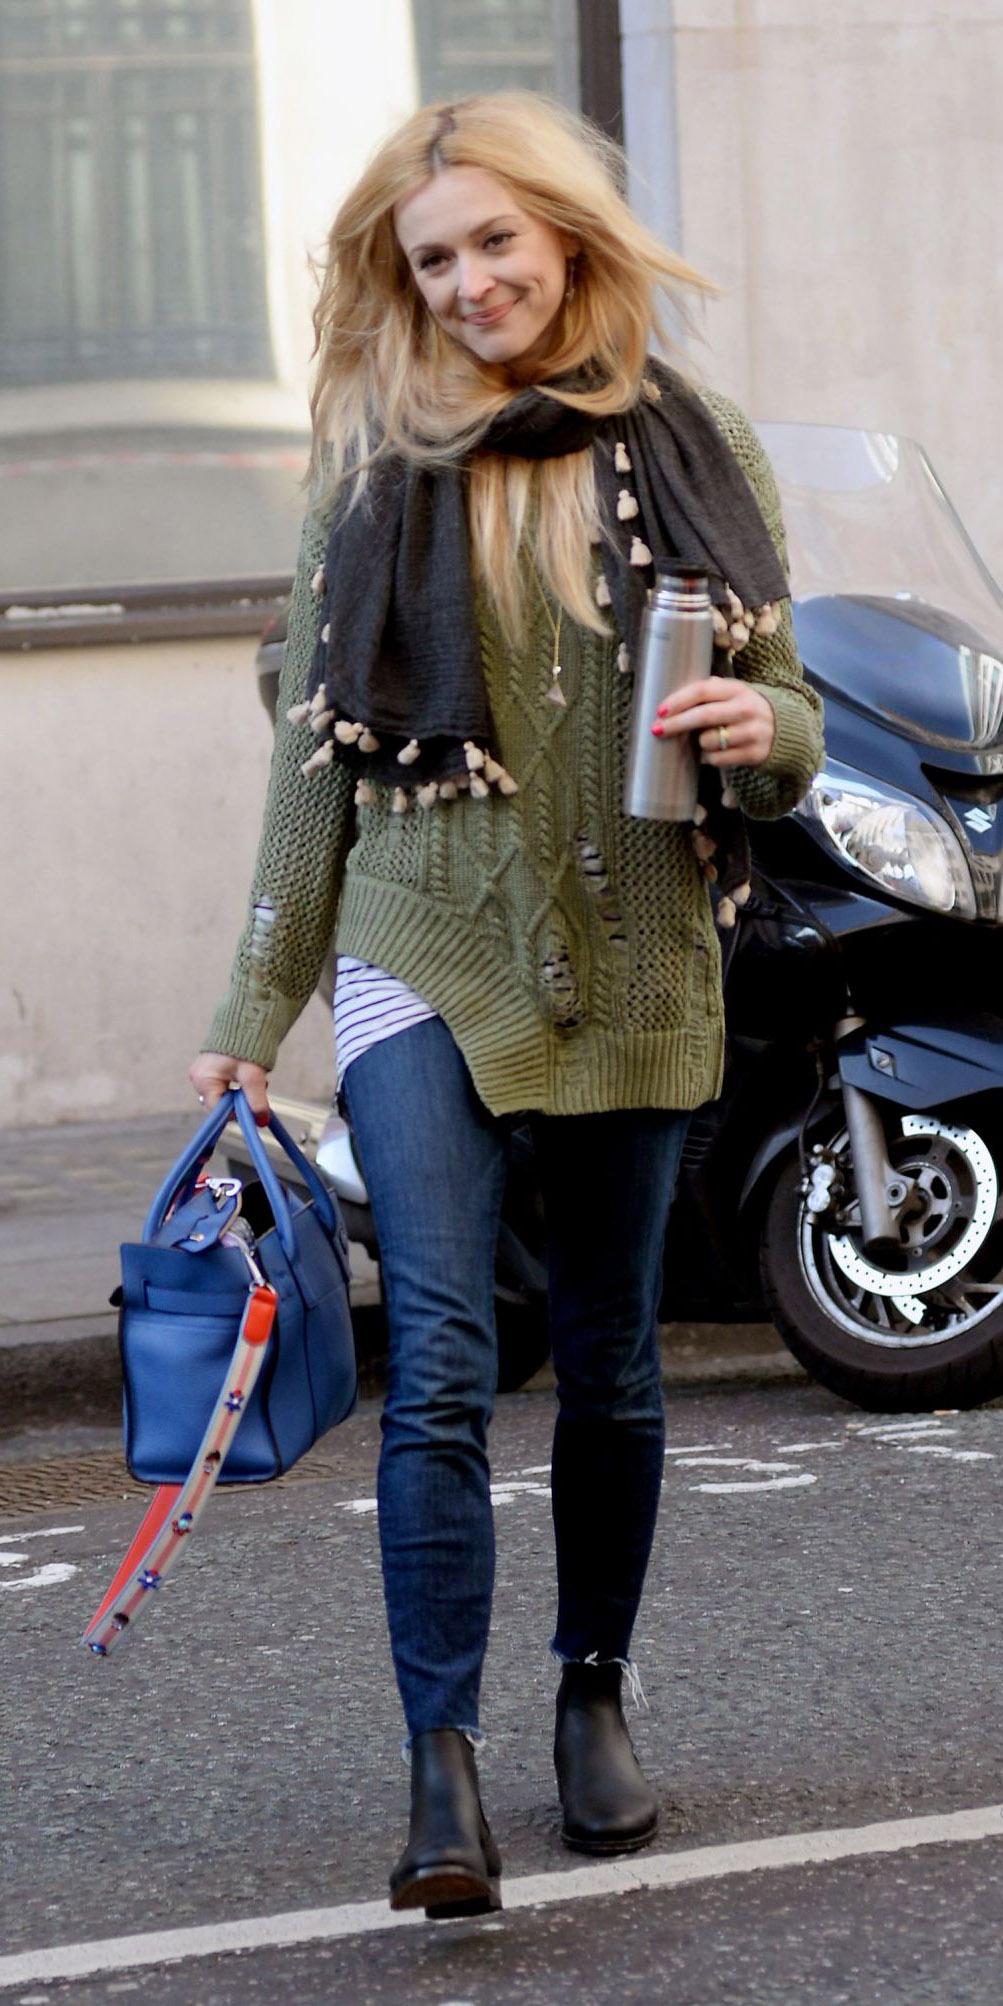 blue-navy-skinny-jeans-green-olive-sweater-grayd-scarf-blue-bag-black-shoe-booties-fearnecotton-blonde-fall-winter-weekend.jpg